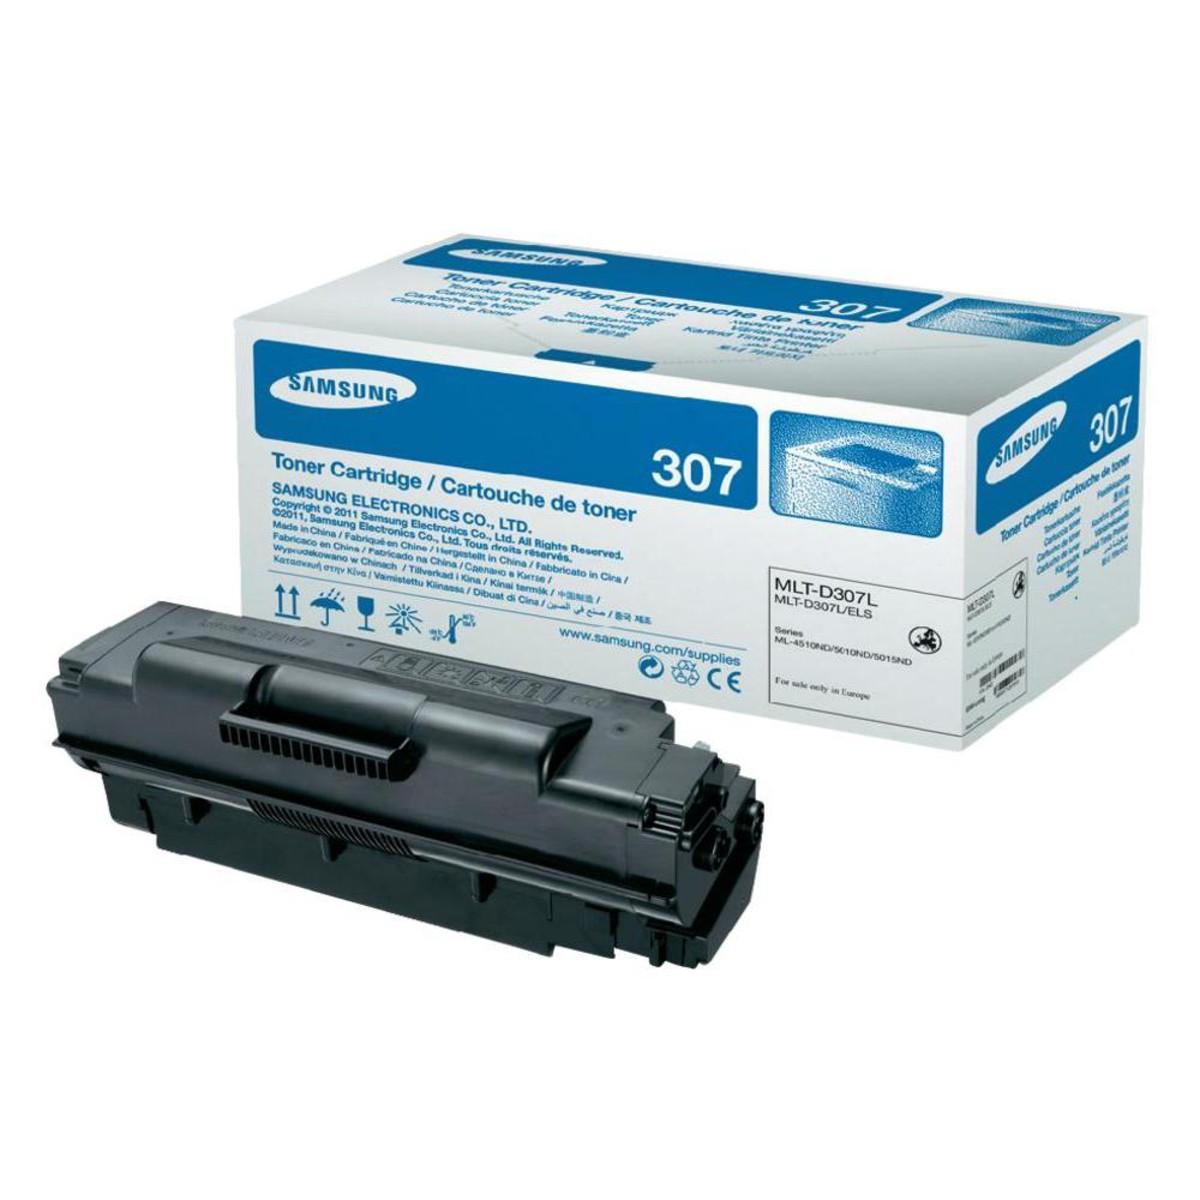 Samsung MLT-D307L Black Toner Cartridge